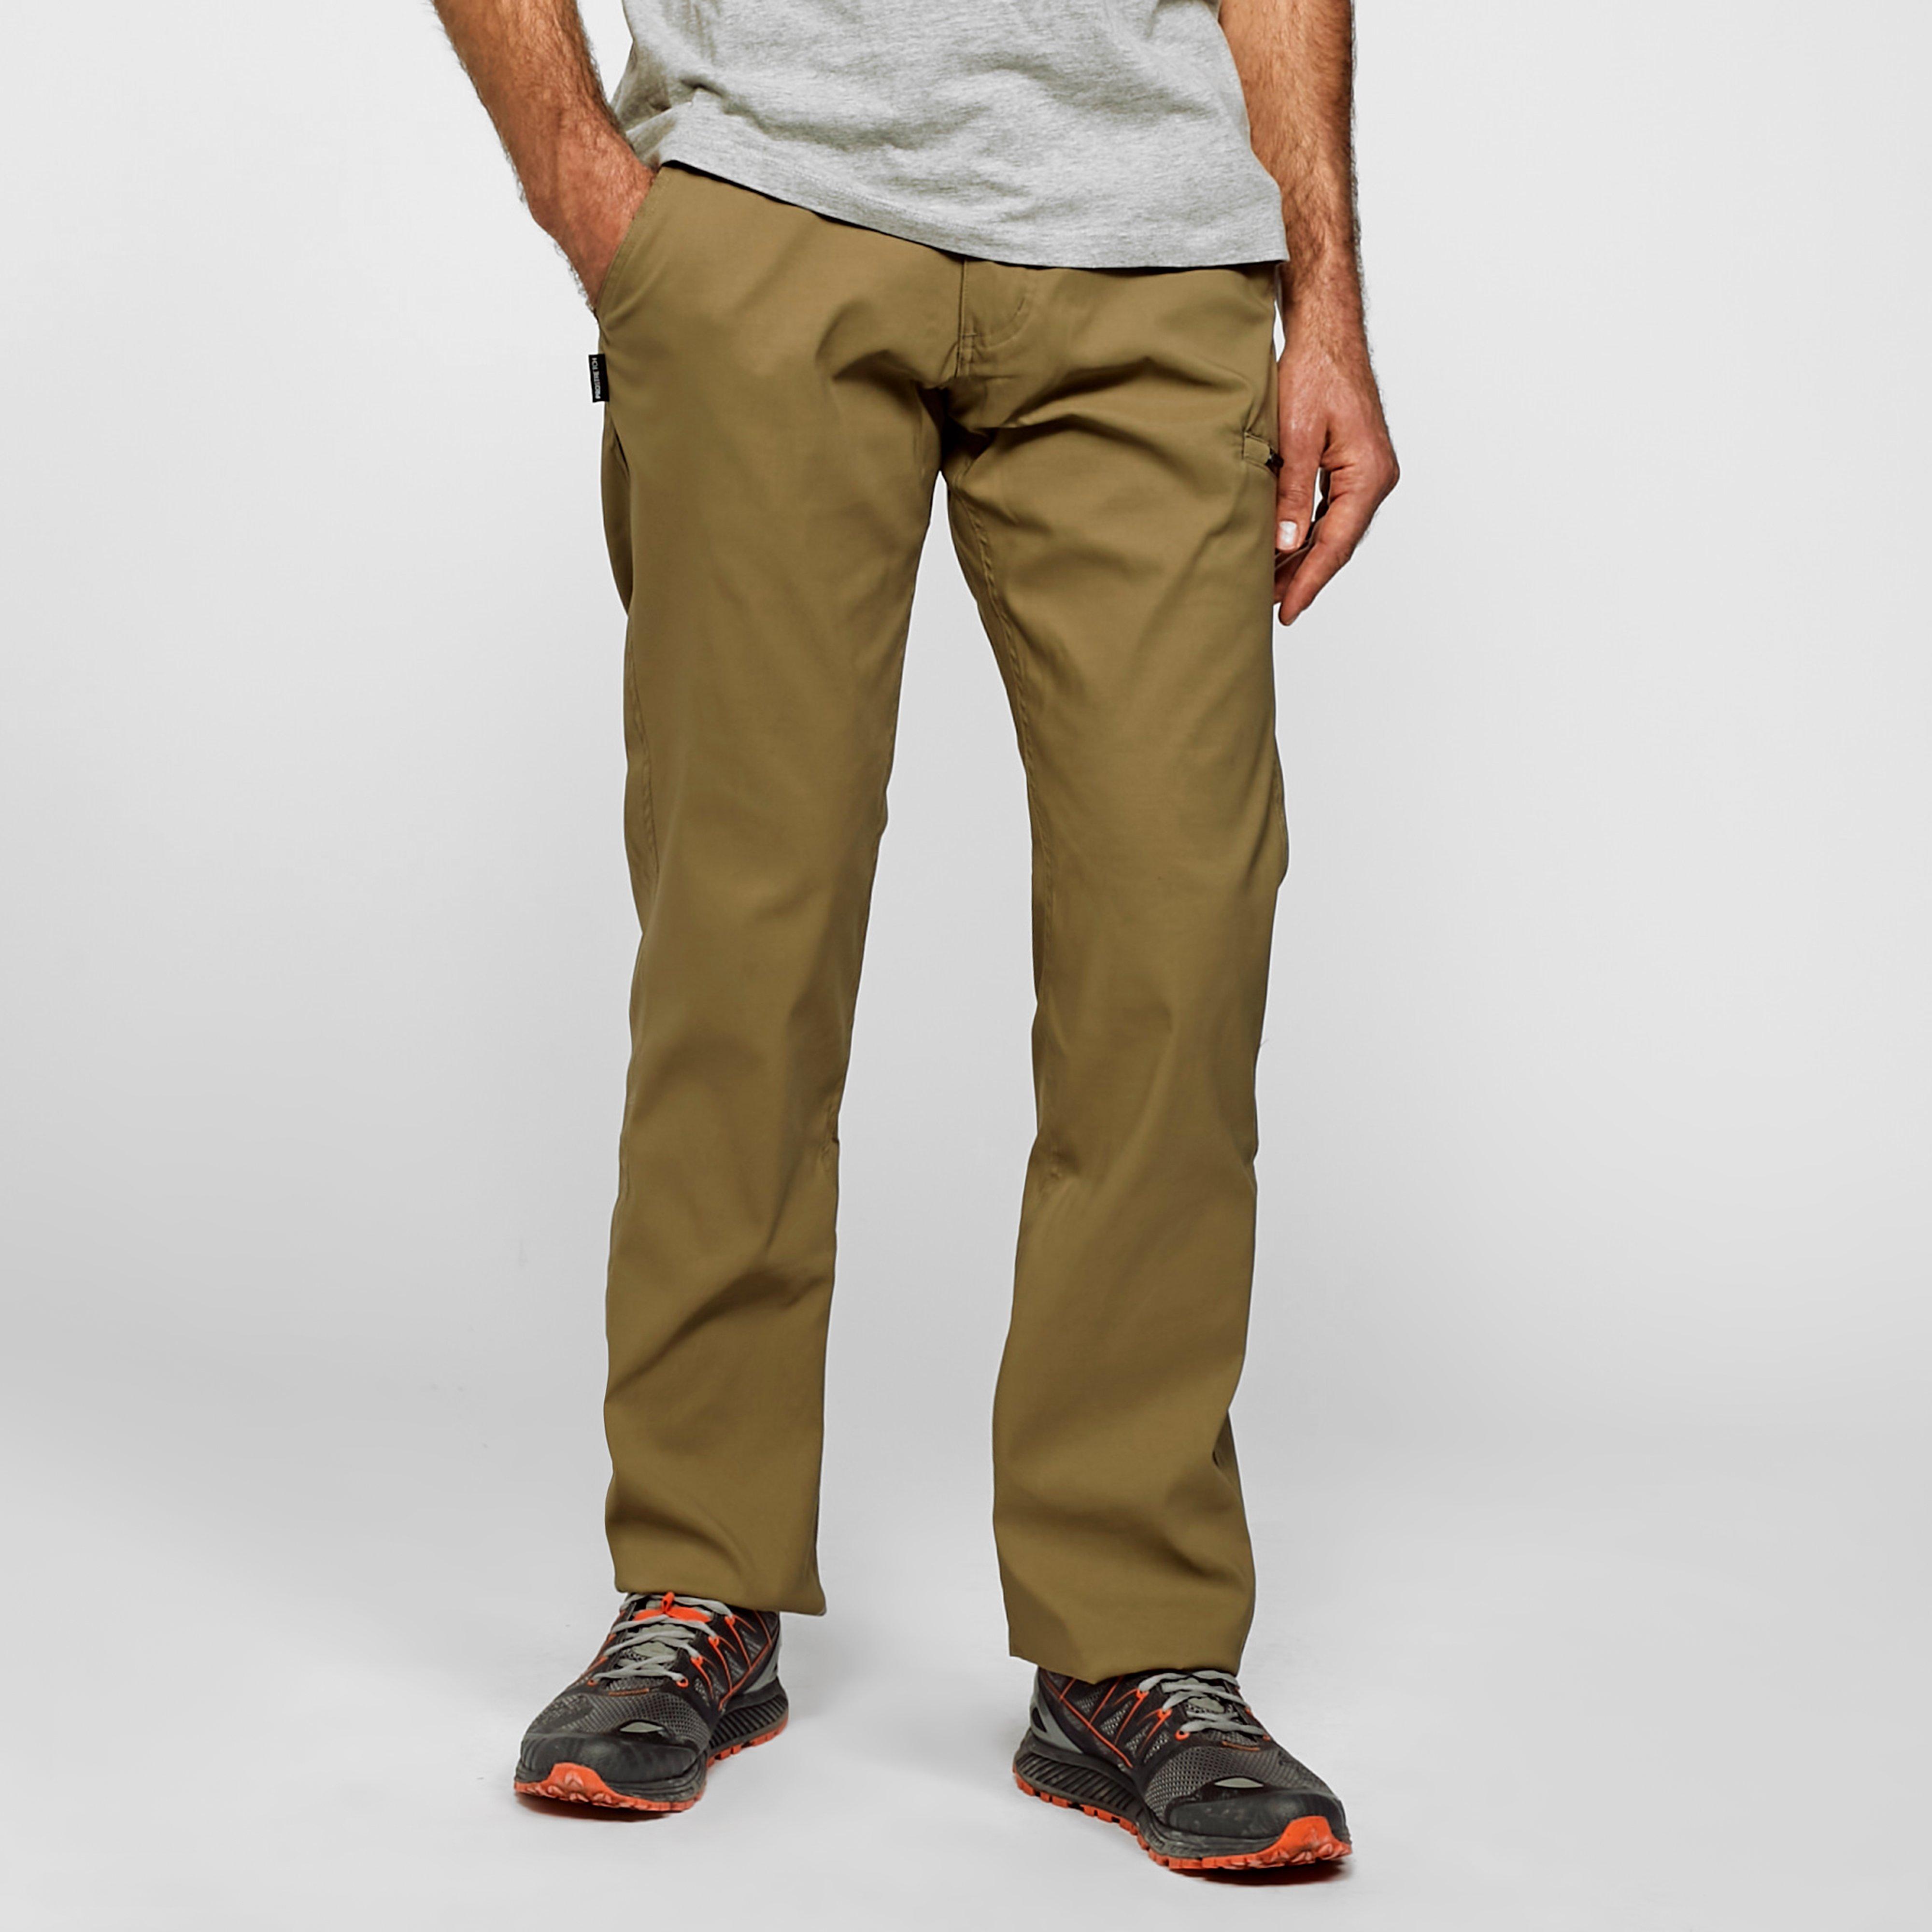 Craghoppers Mens Kiwi Pro Stretch Trousers (long) - Beige/bei  Beige/bei